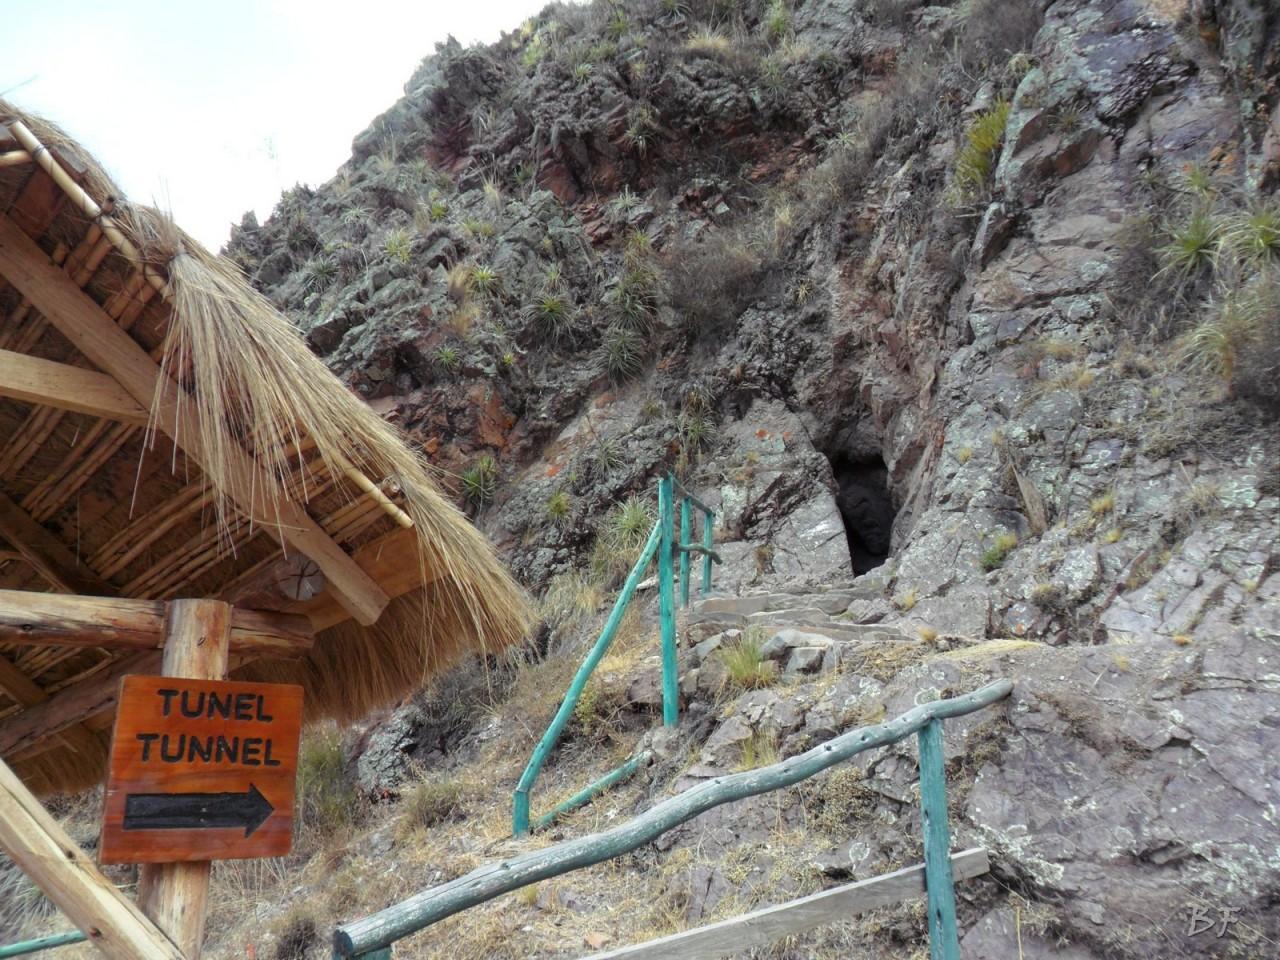 Mura-Poligonali-Megaliti-Altari-Rupestri-Pisac-Cusco-Perù-33